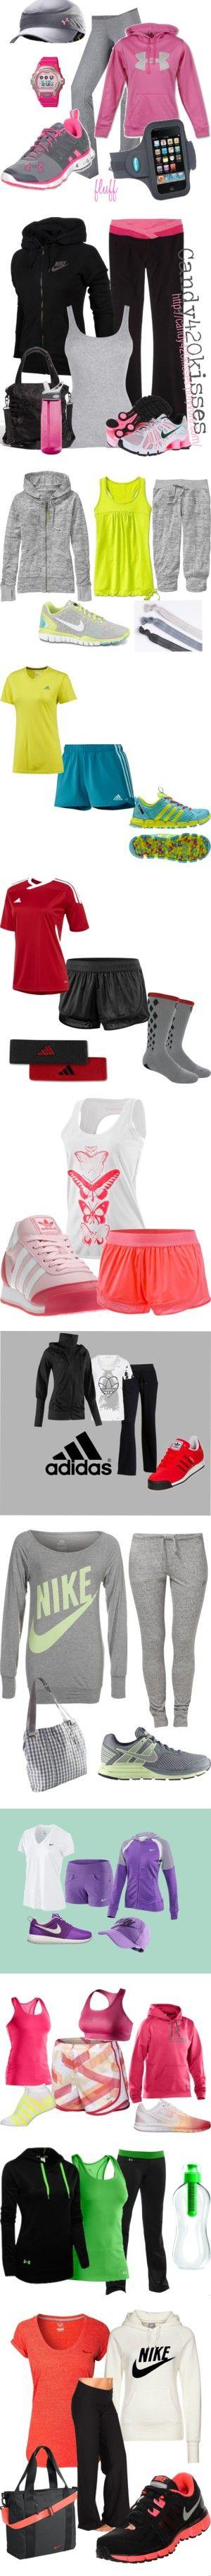 .workout